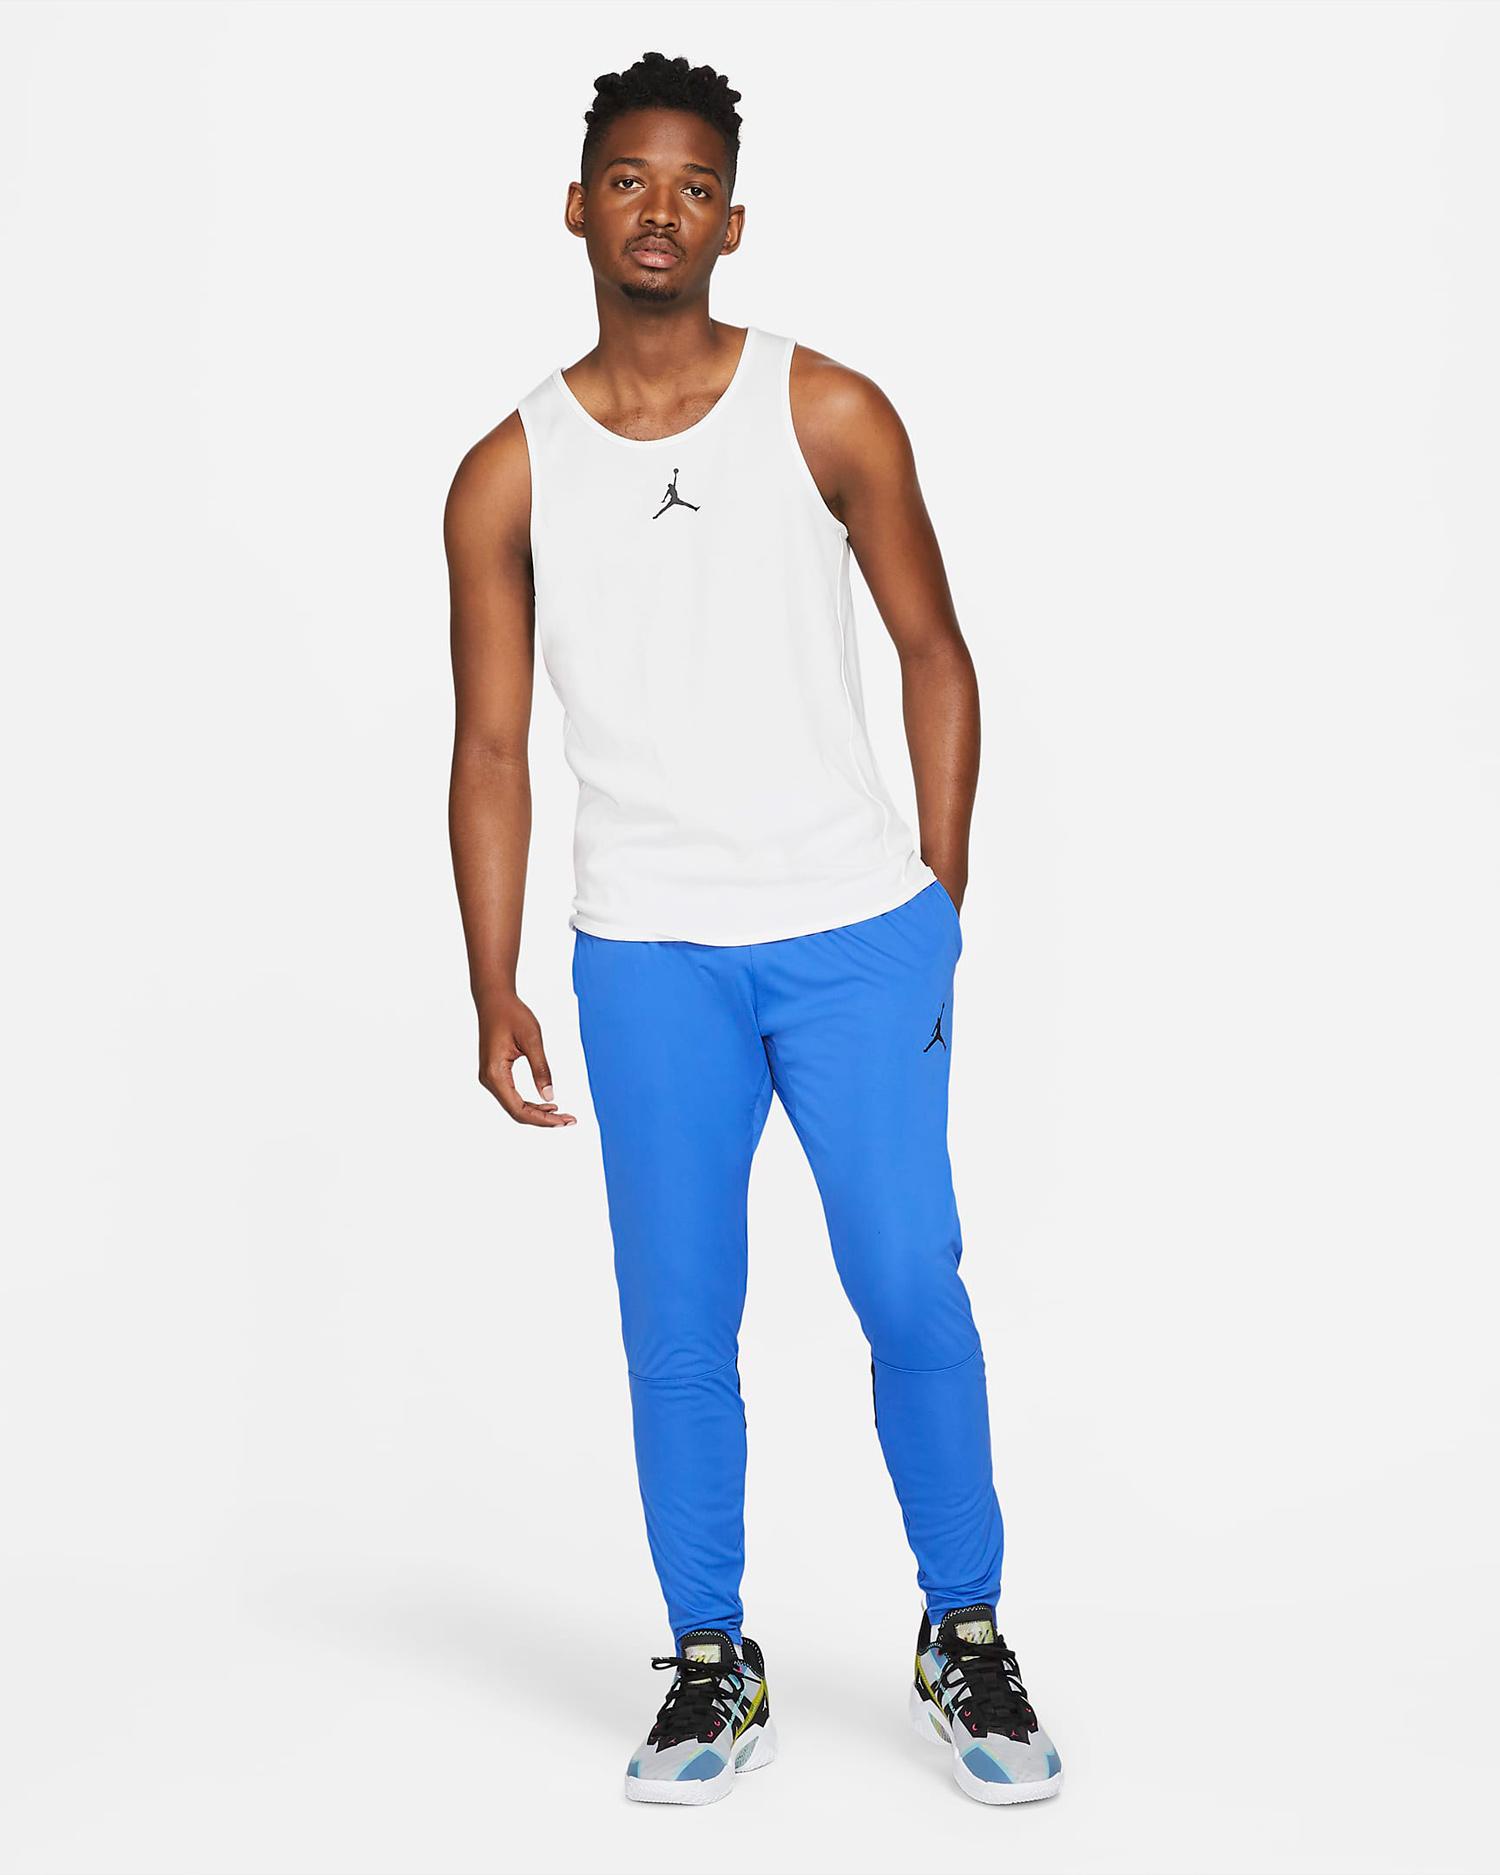 jordan-dri-fit-air-hyper-royal-pants-shirt-outfit